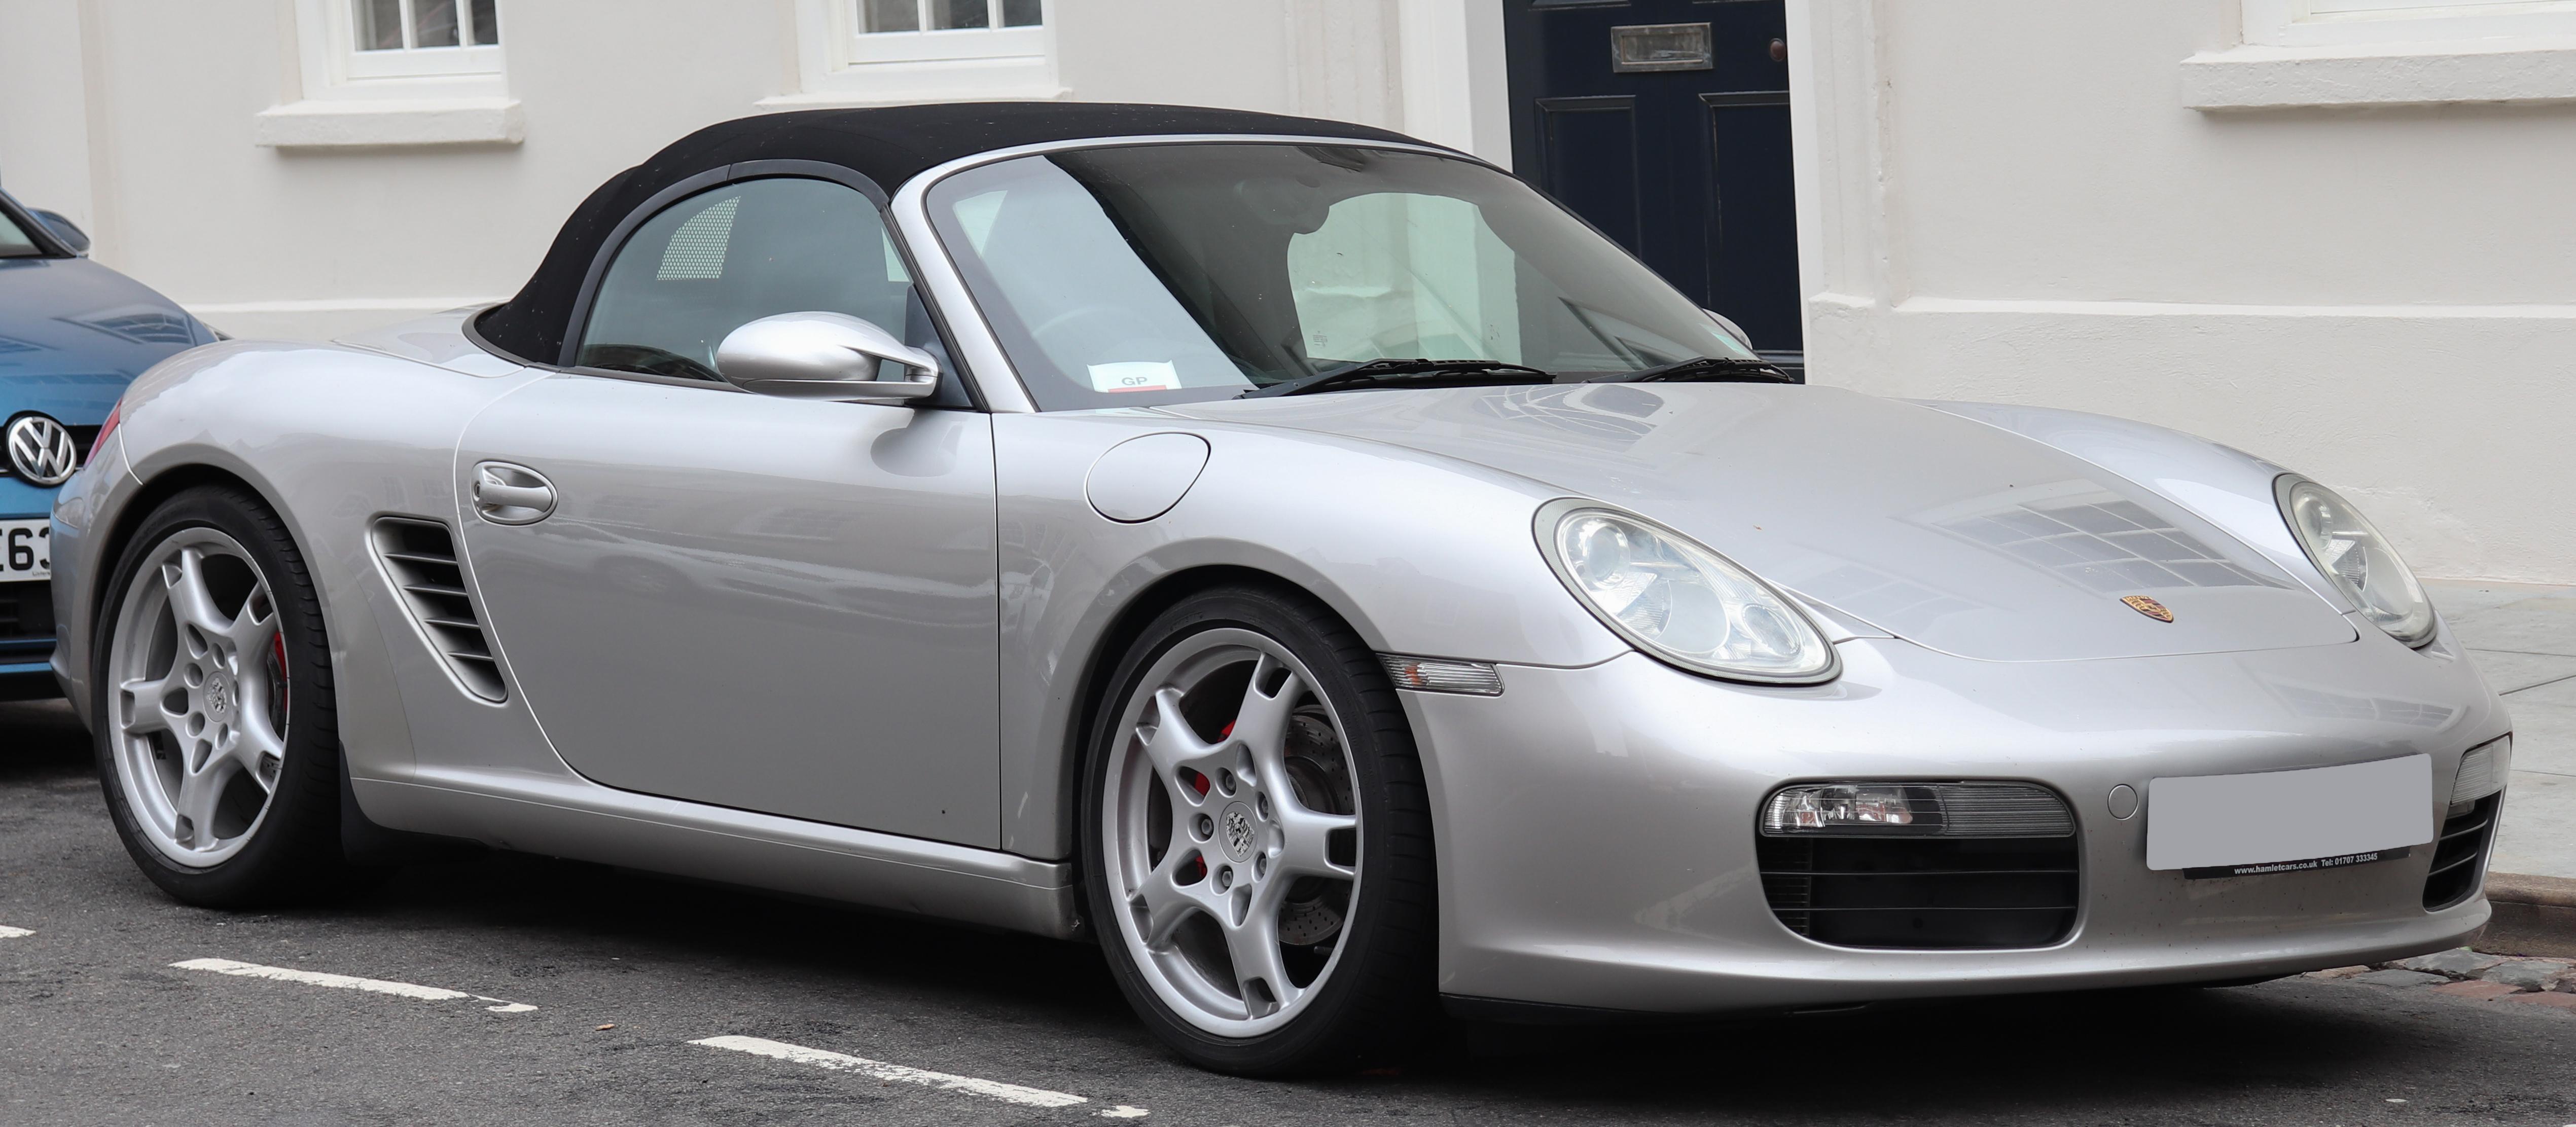 Porsche 987 Wikipedia